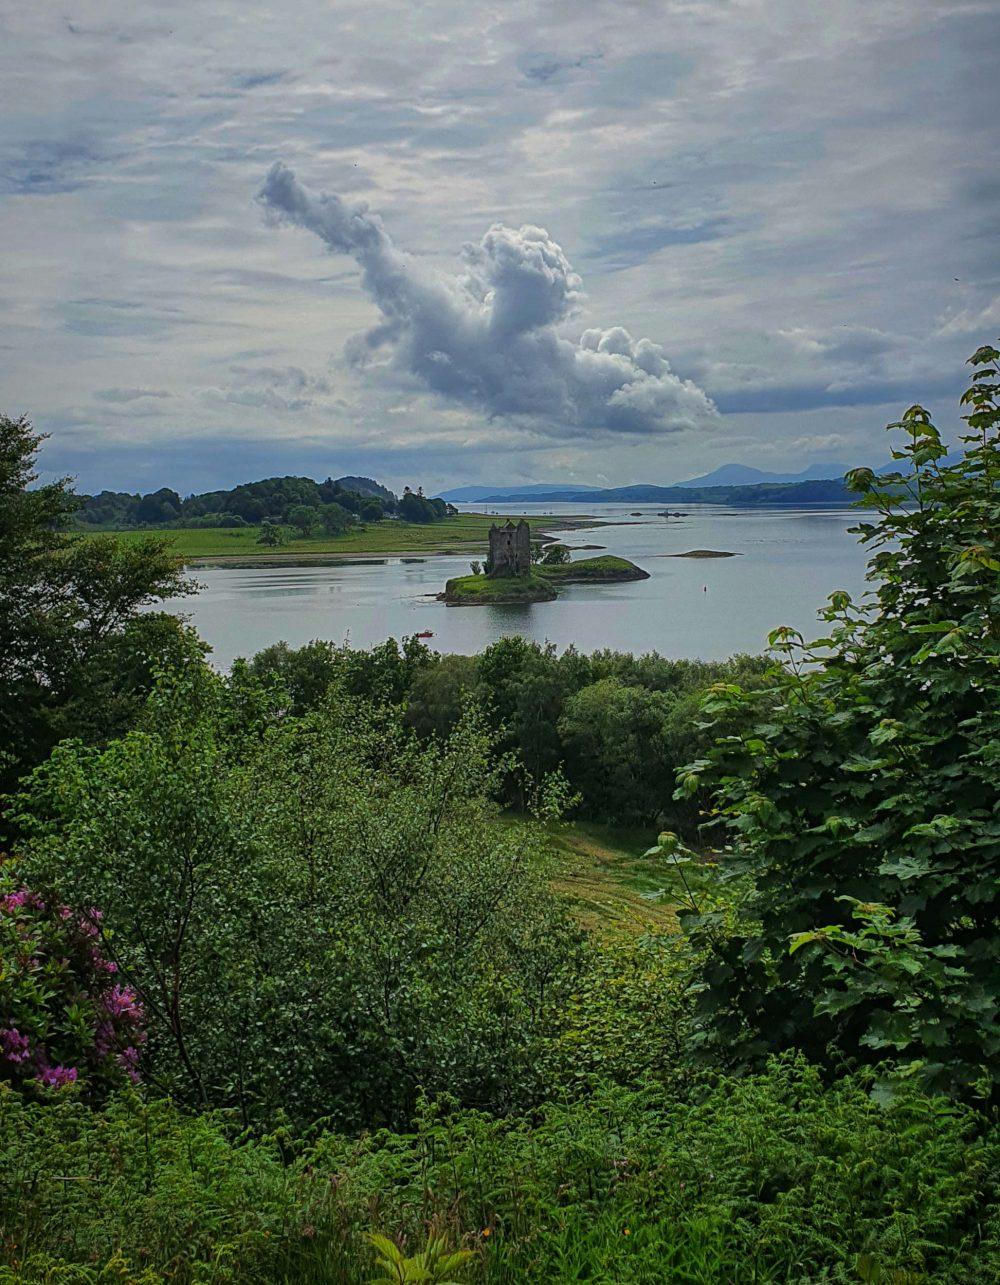 Cloud resembling dragon over castle- Scottish News